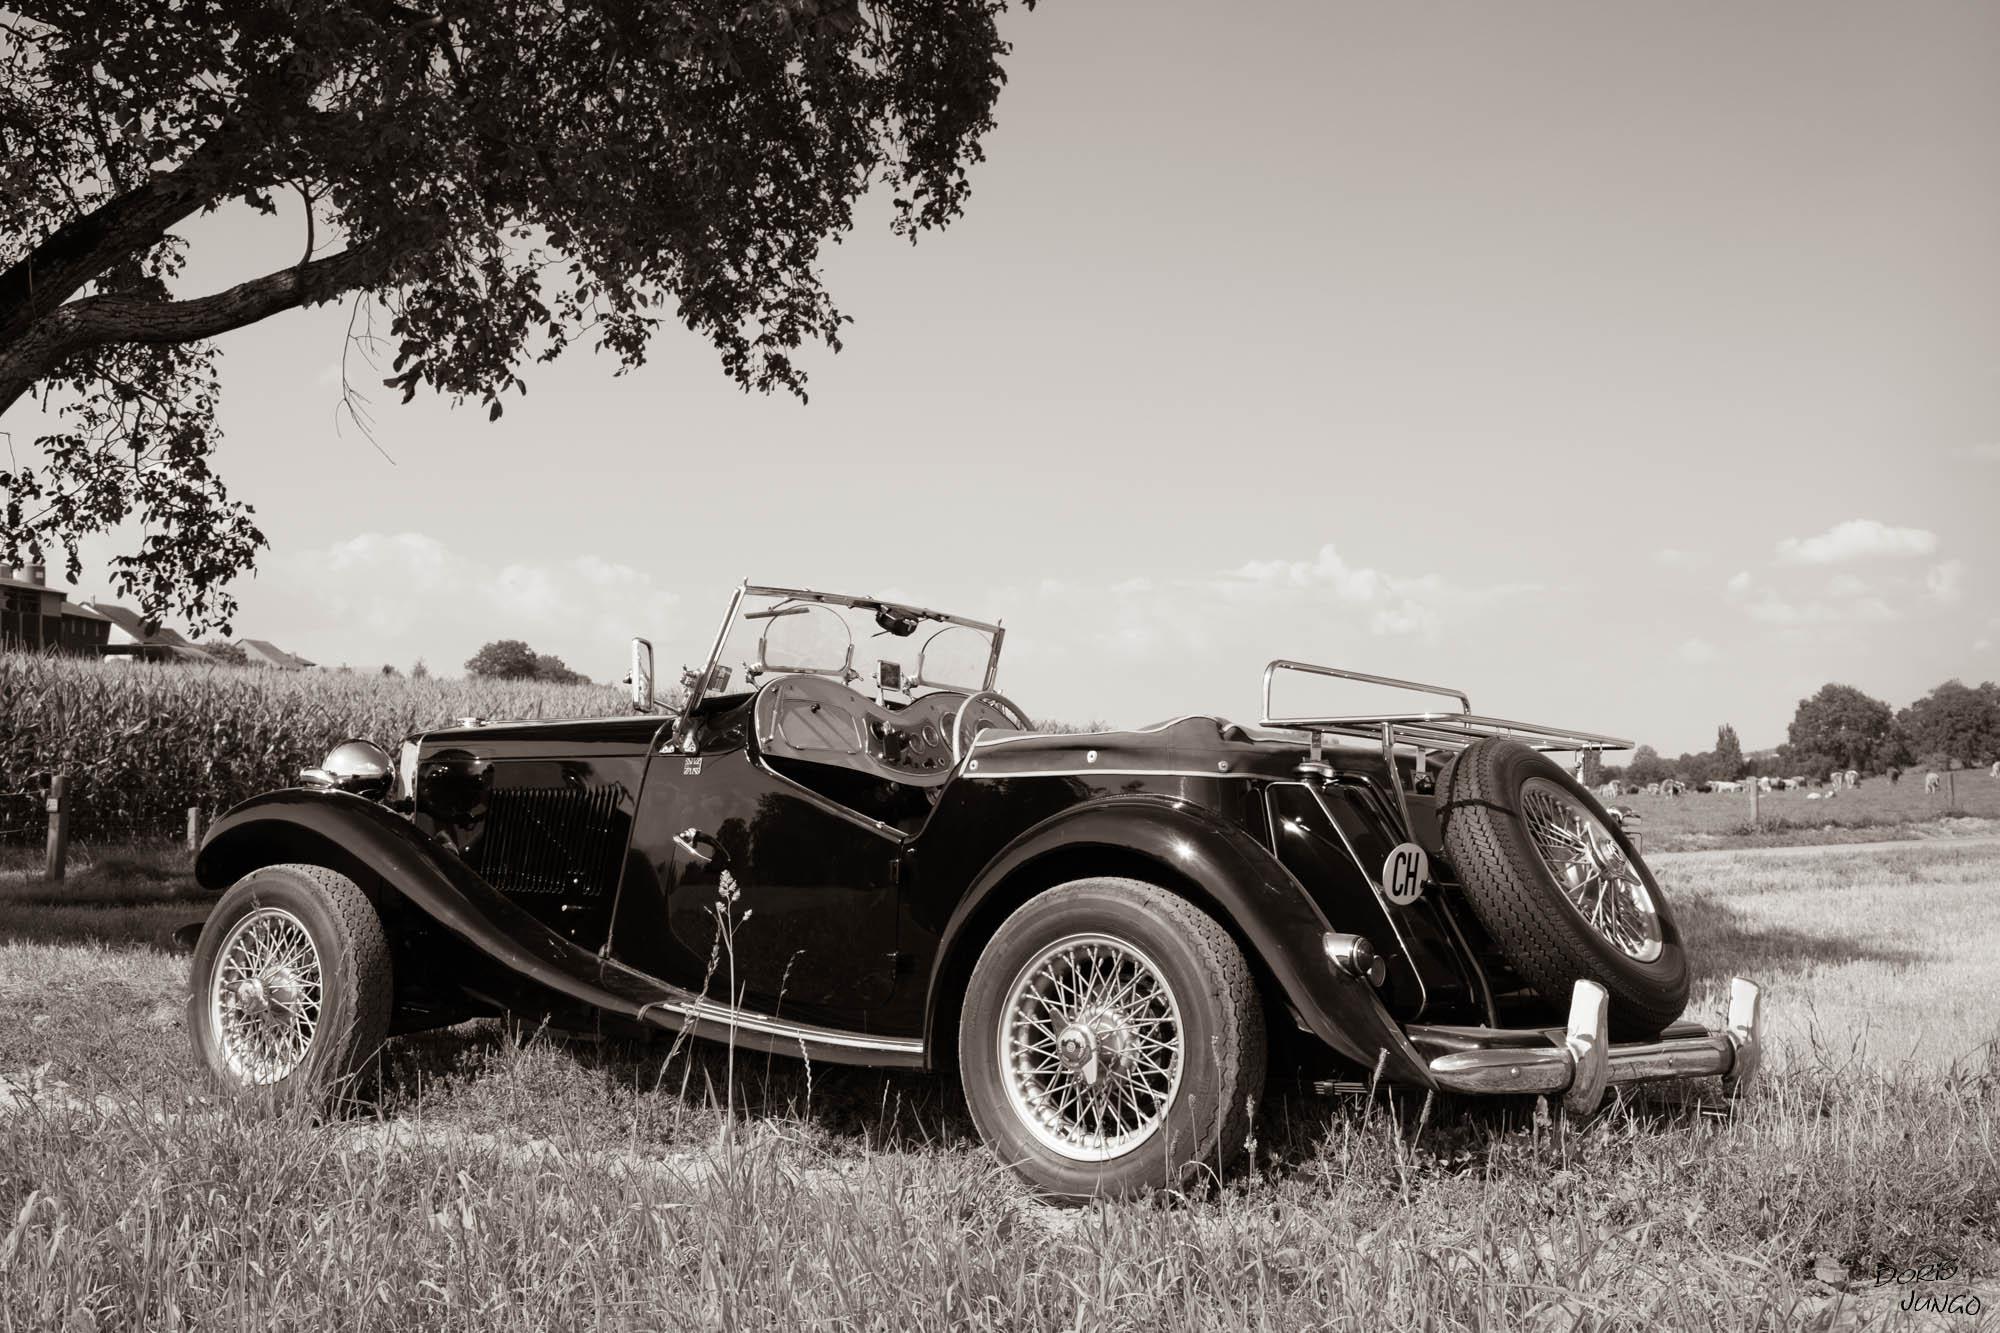 MG TD 1953 Vers-chez-Perrin